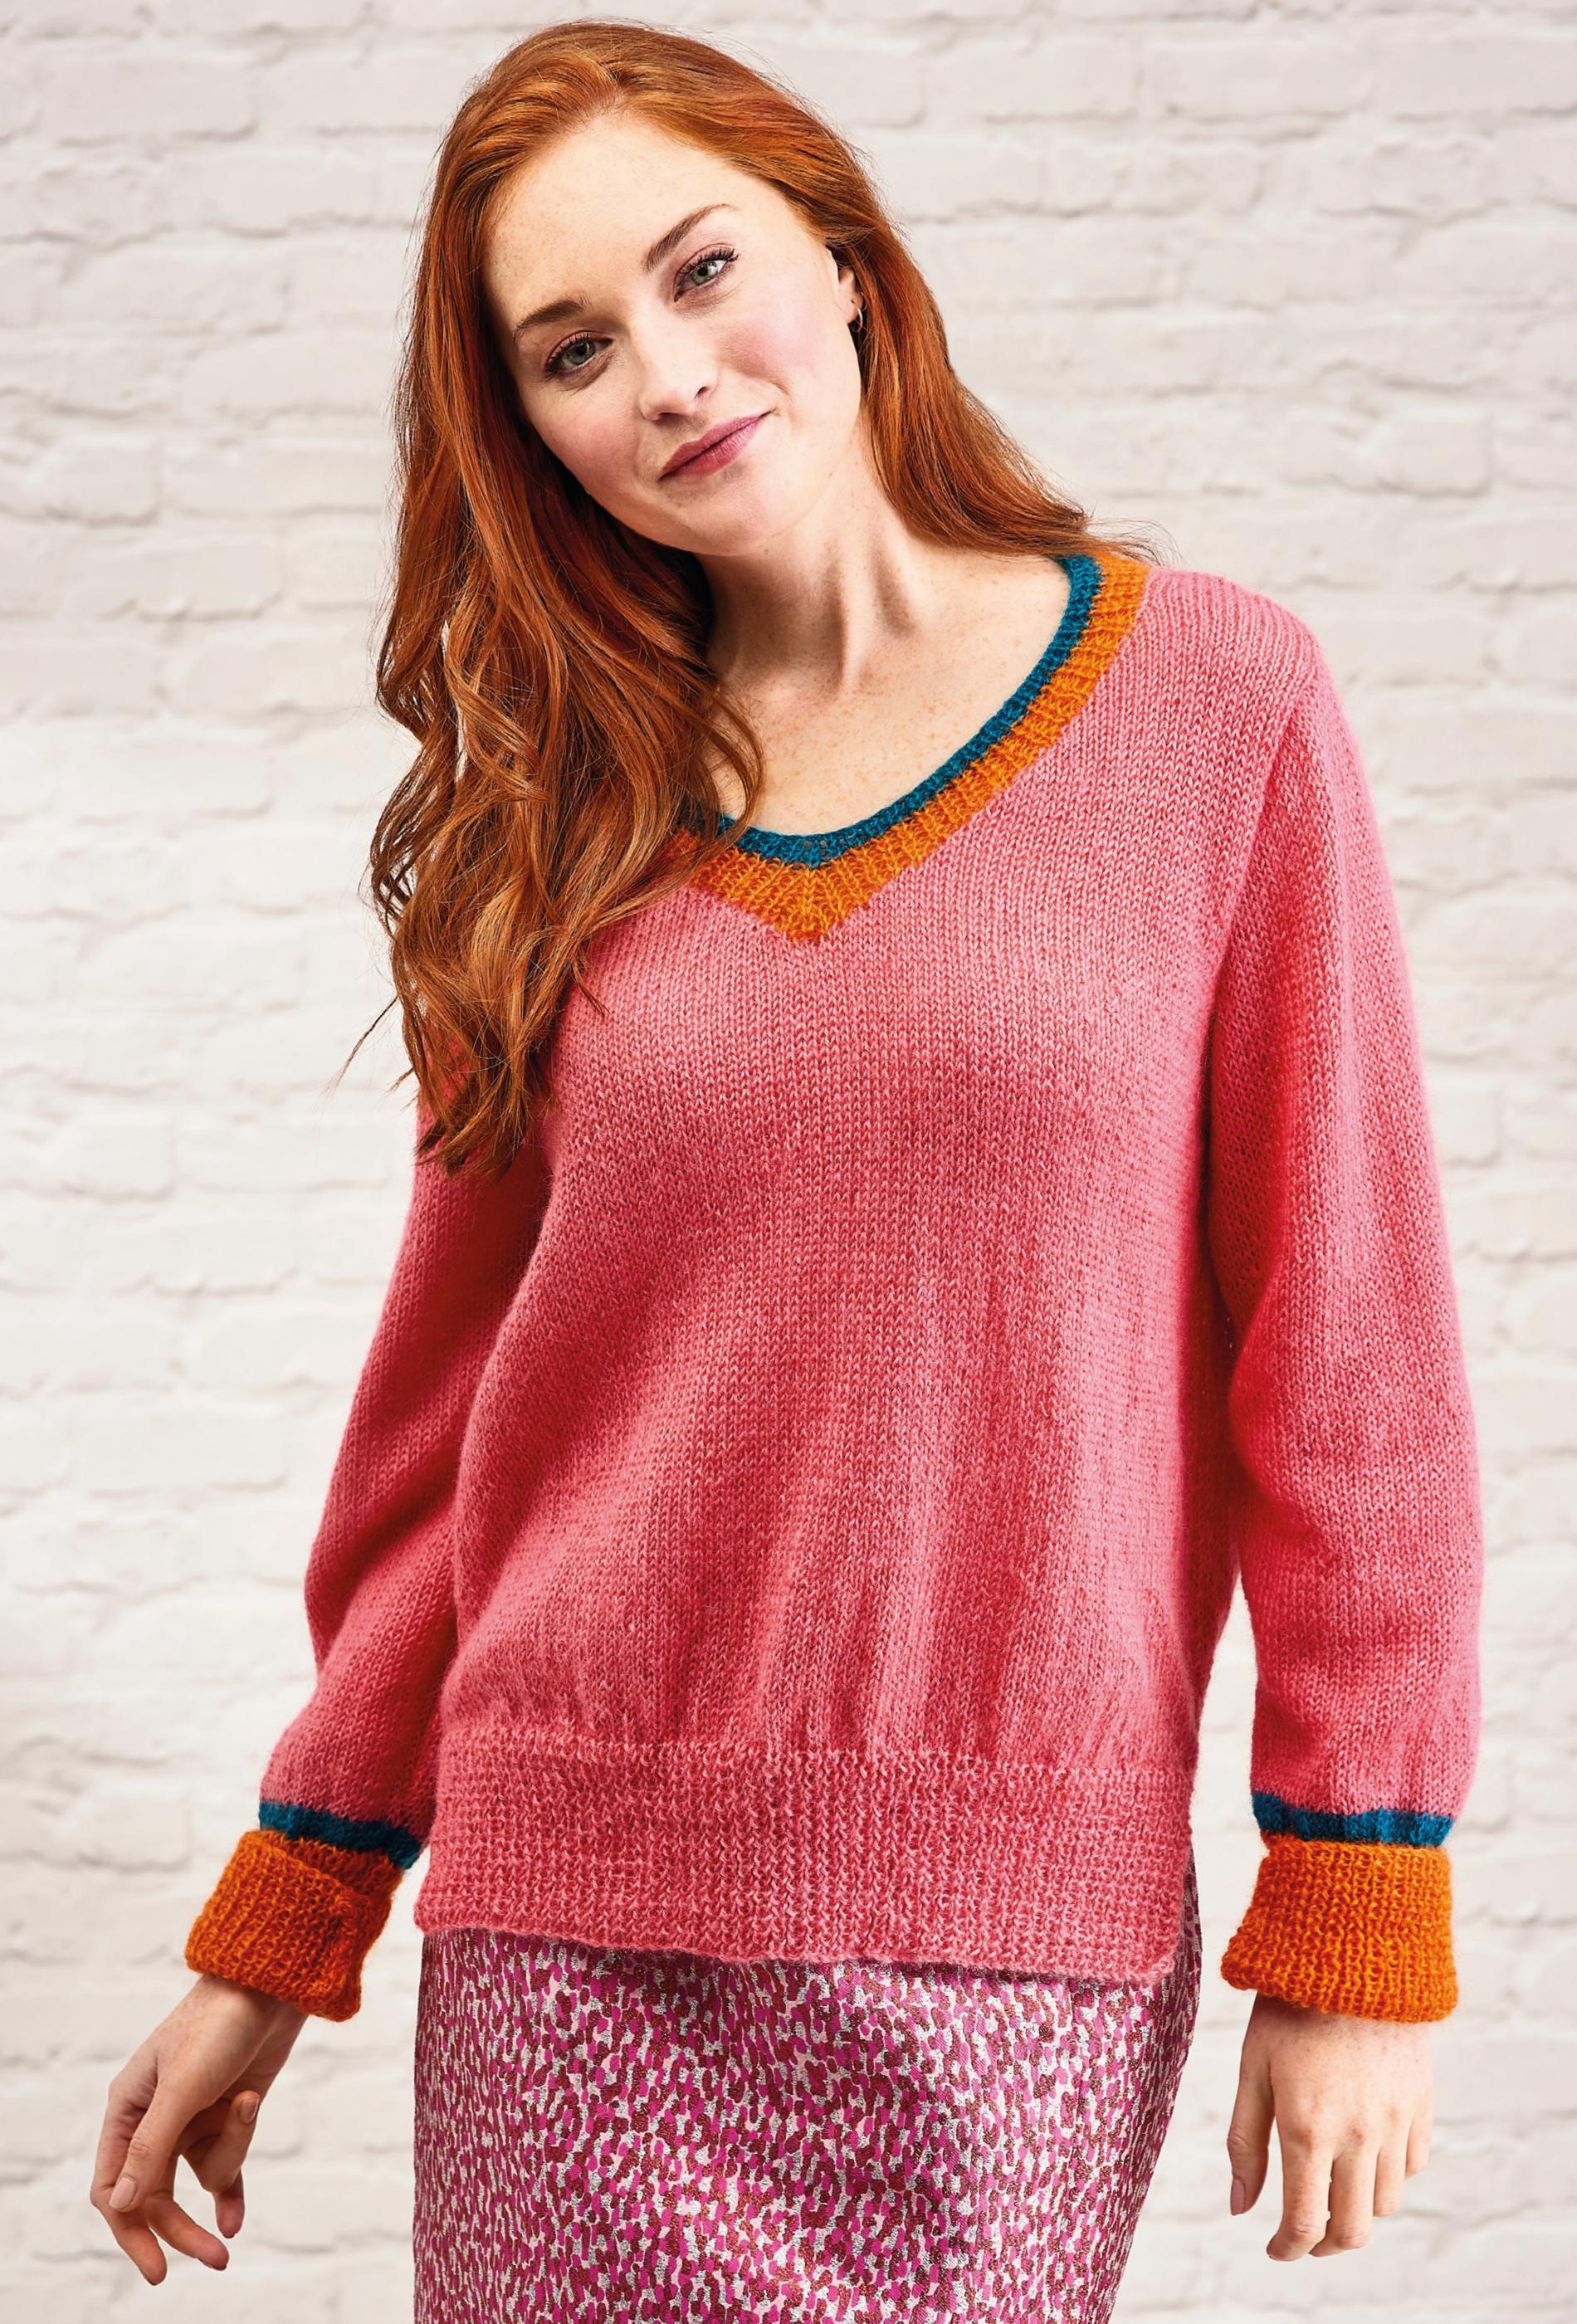 Simple V Neck Jumper   Knitting Patterns   Let's Knit Magazine